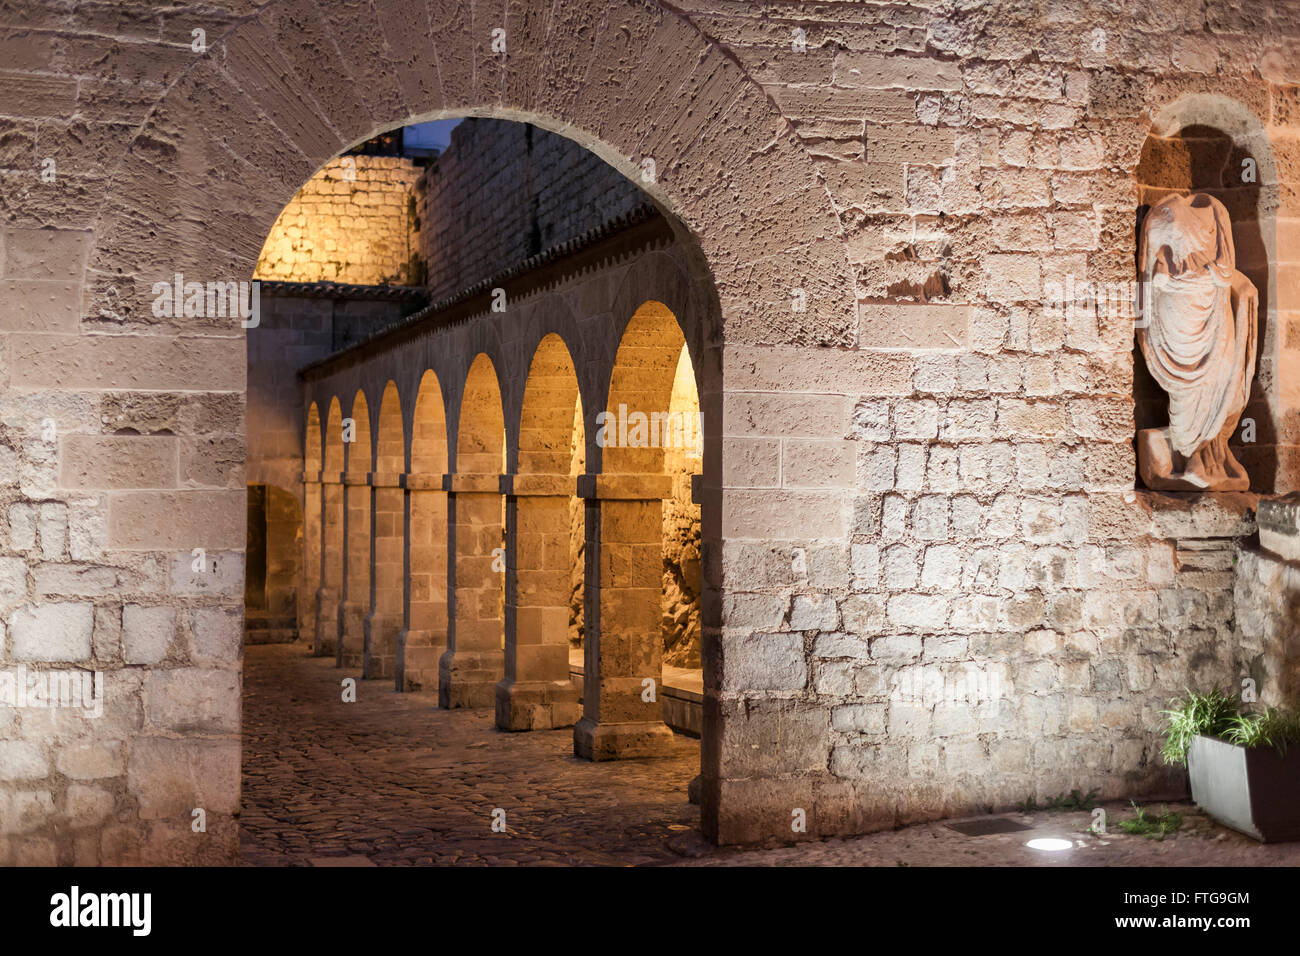 Patio de Armas-Armoury Court,Ibiza-Eivissa,Balearic Islands,Spain. - Stock Image